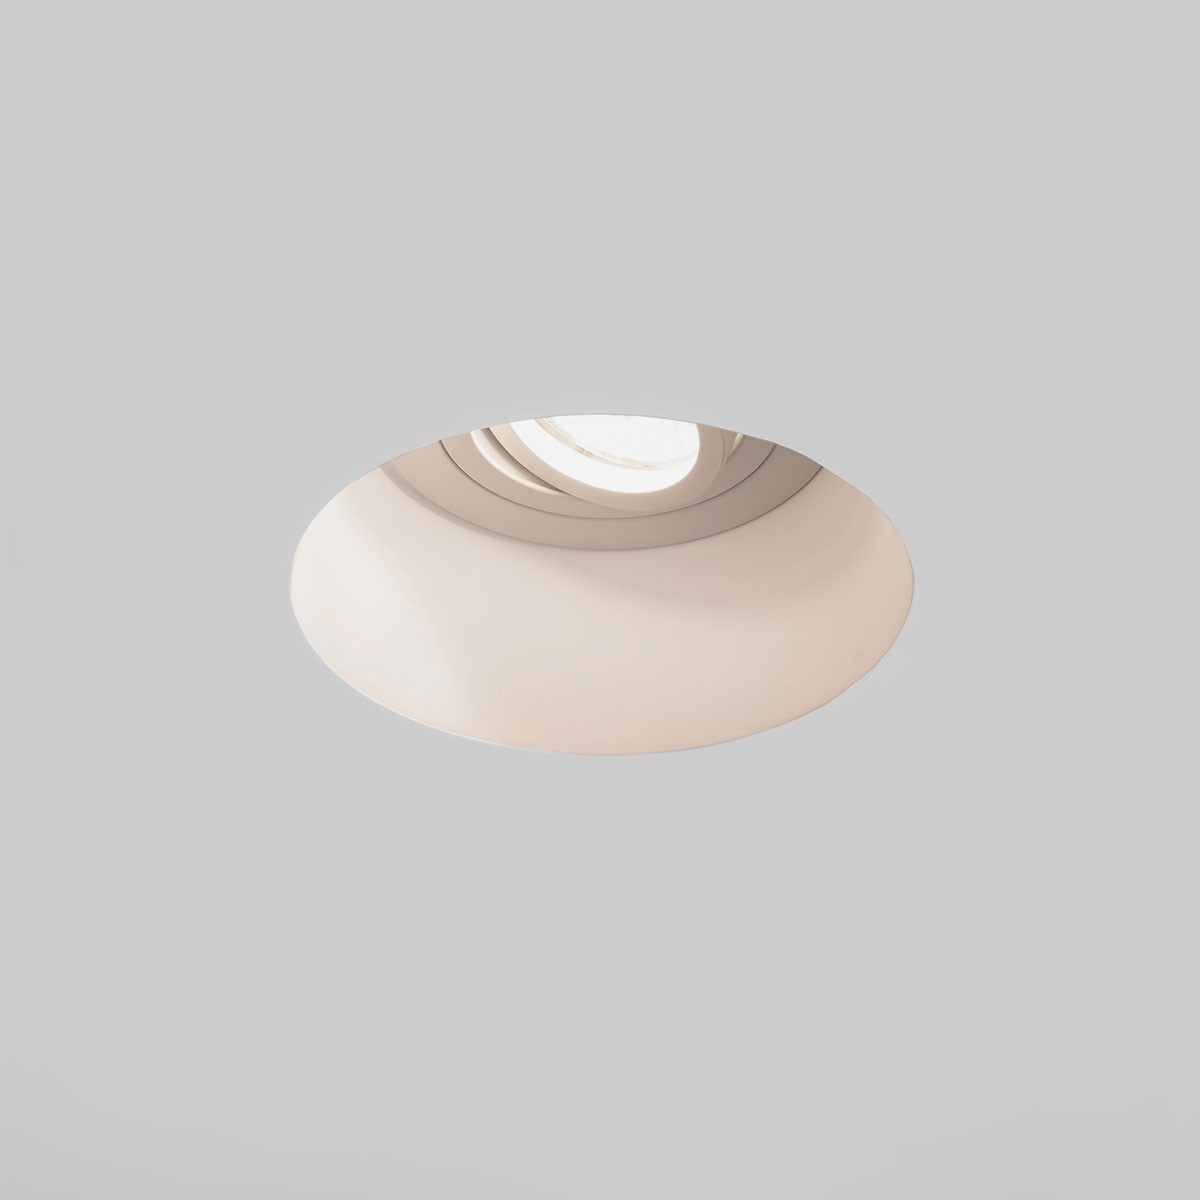 Astro Minima Round Gu10 White Downlight At Uk Electrical Supplies Led Torch Circuit Blanco Plaster Adjustable